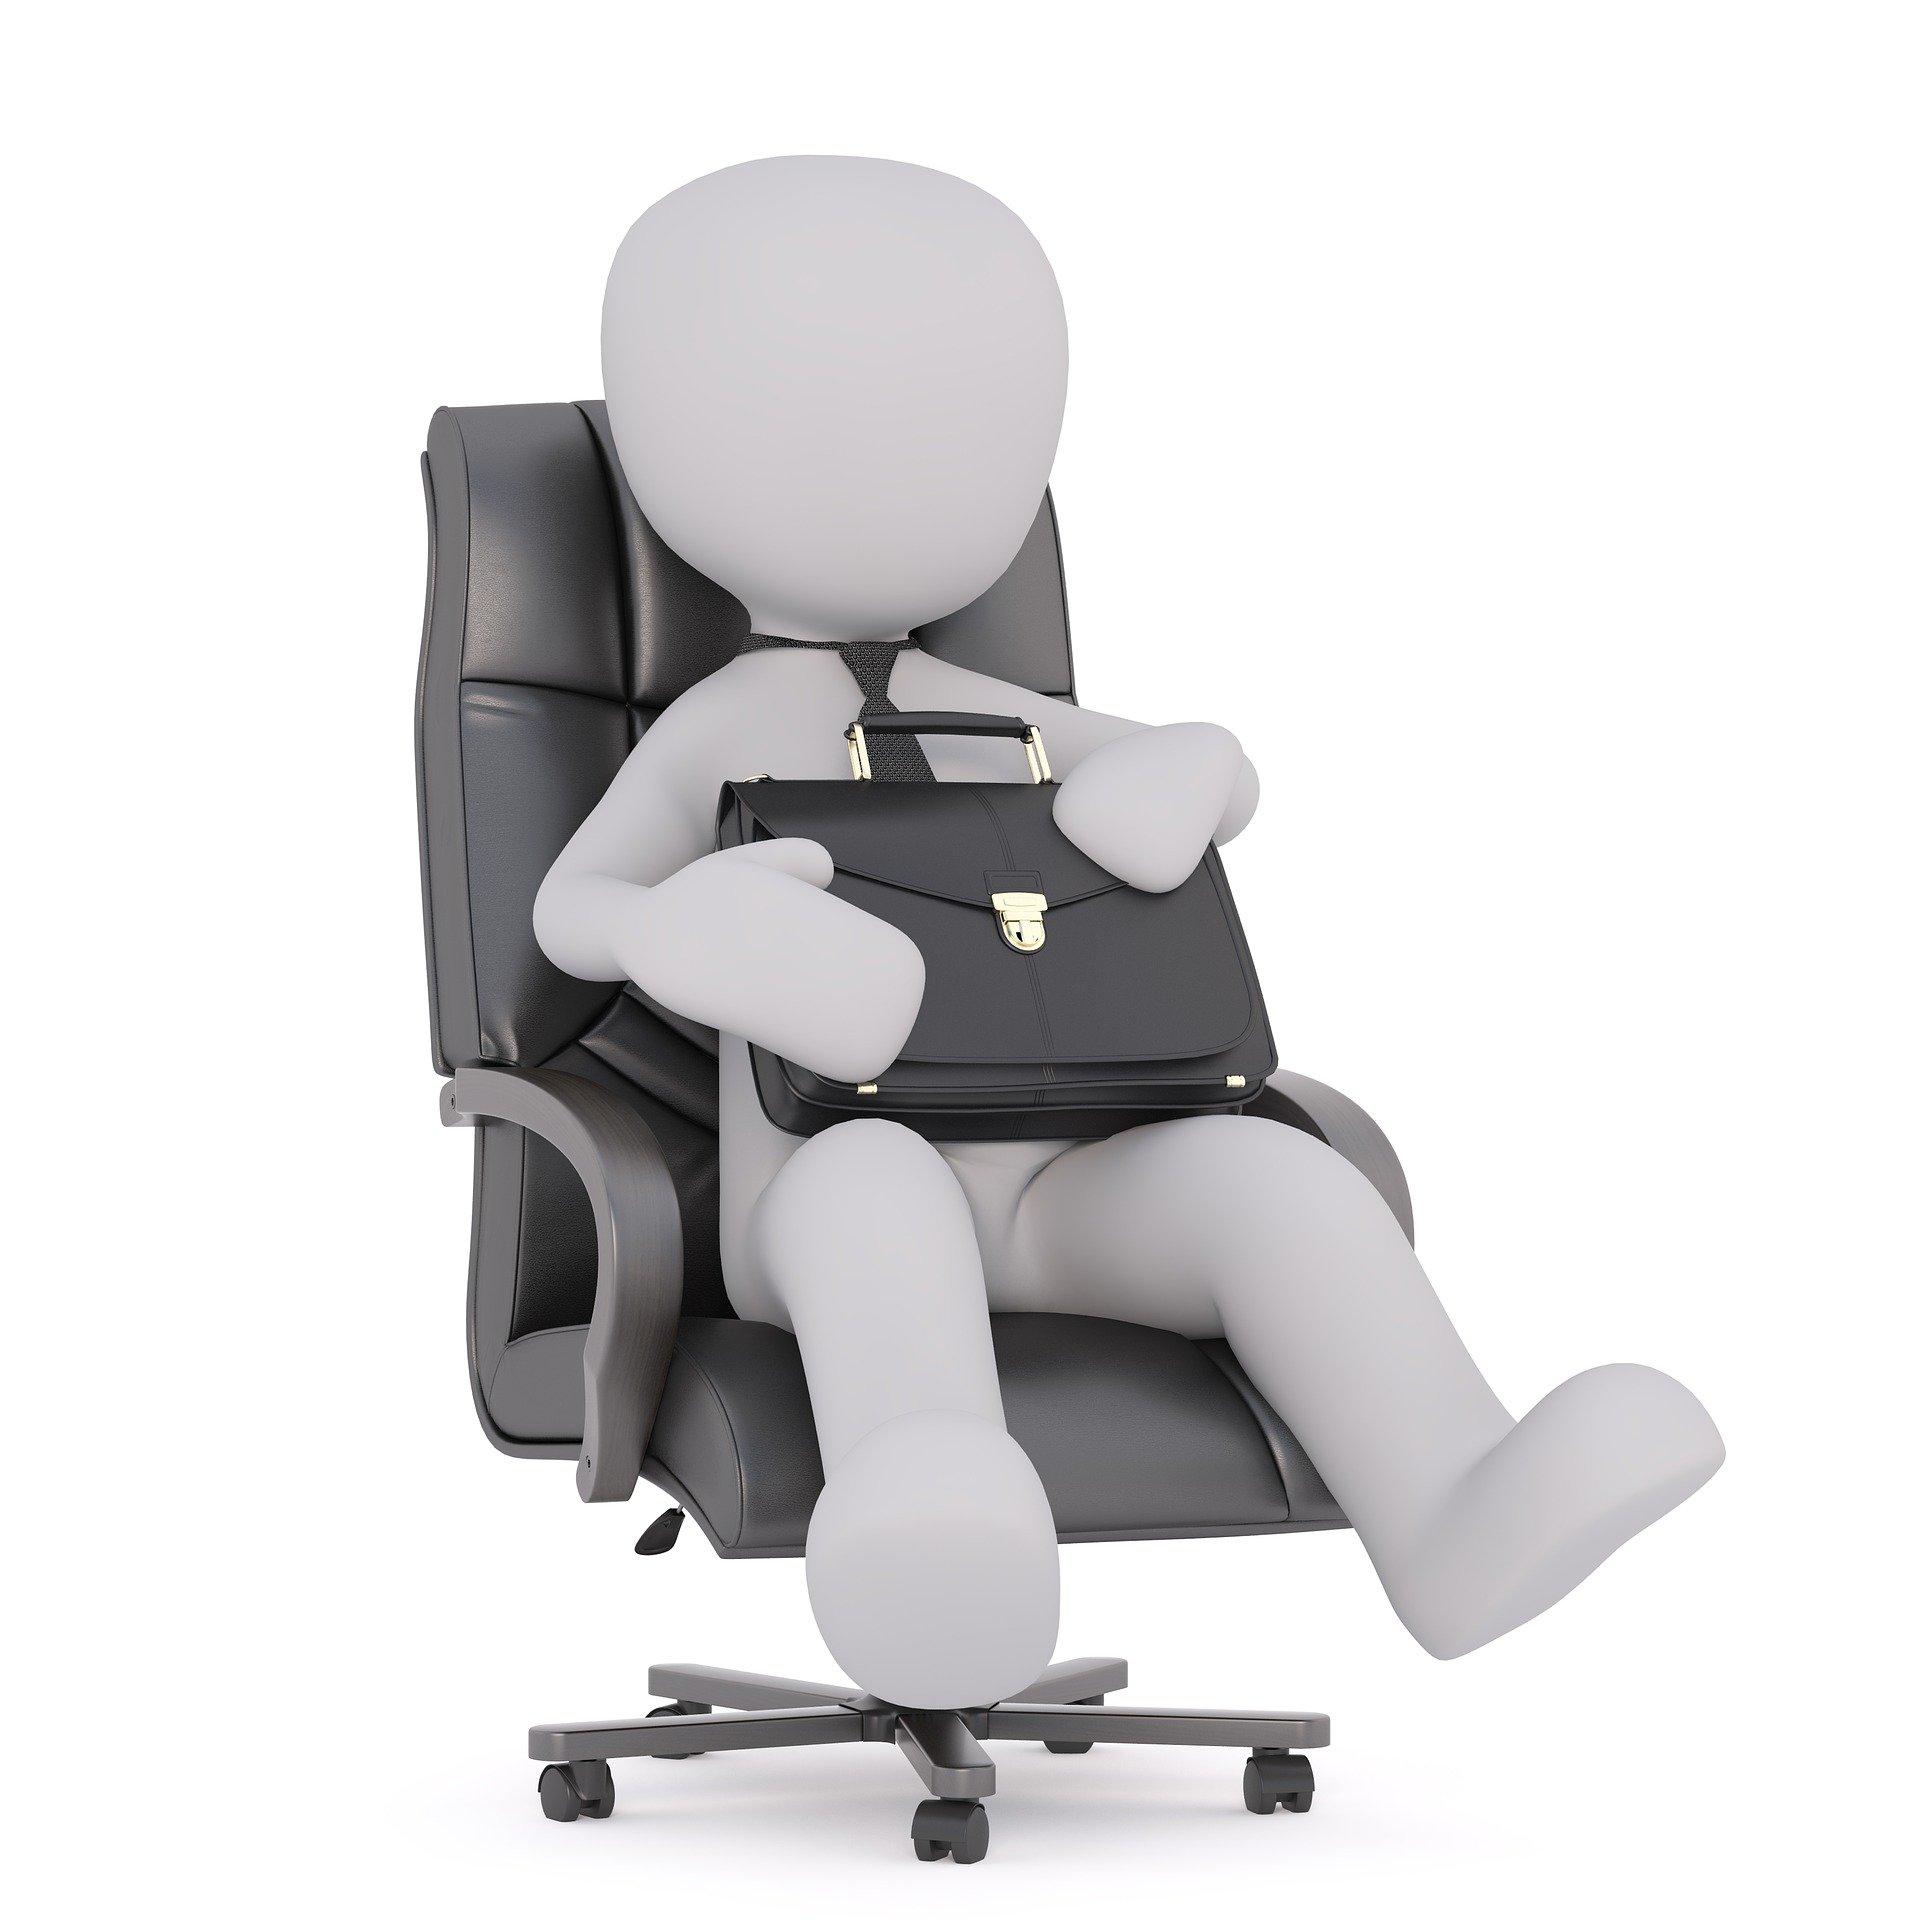 Illustration mand i kontorstol